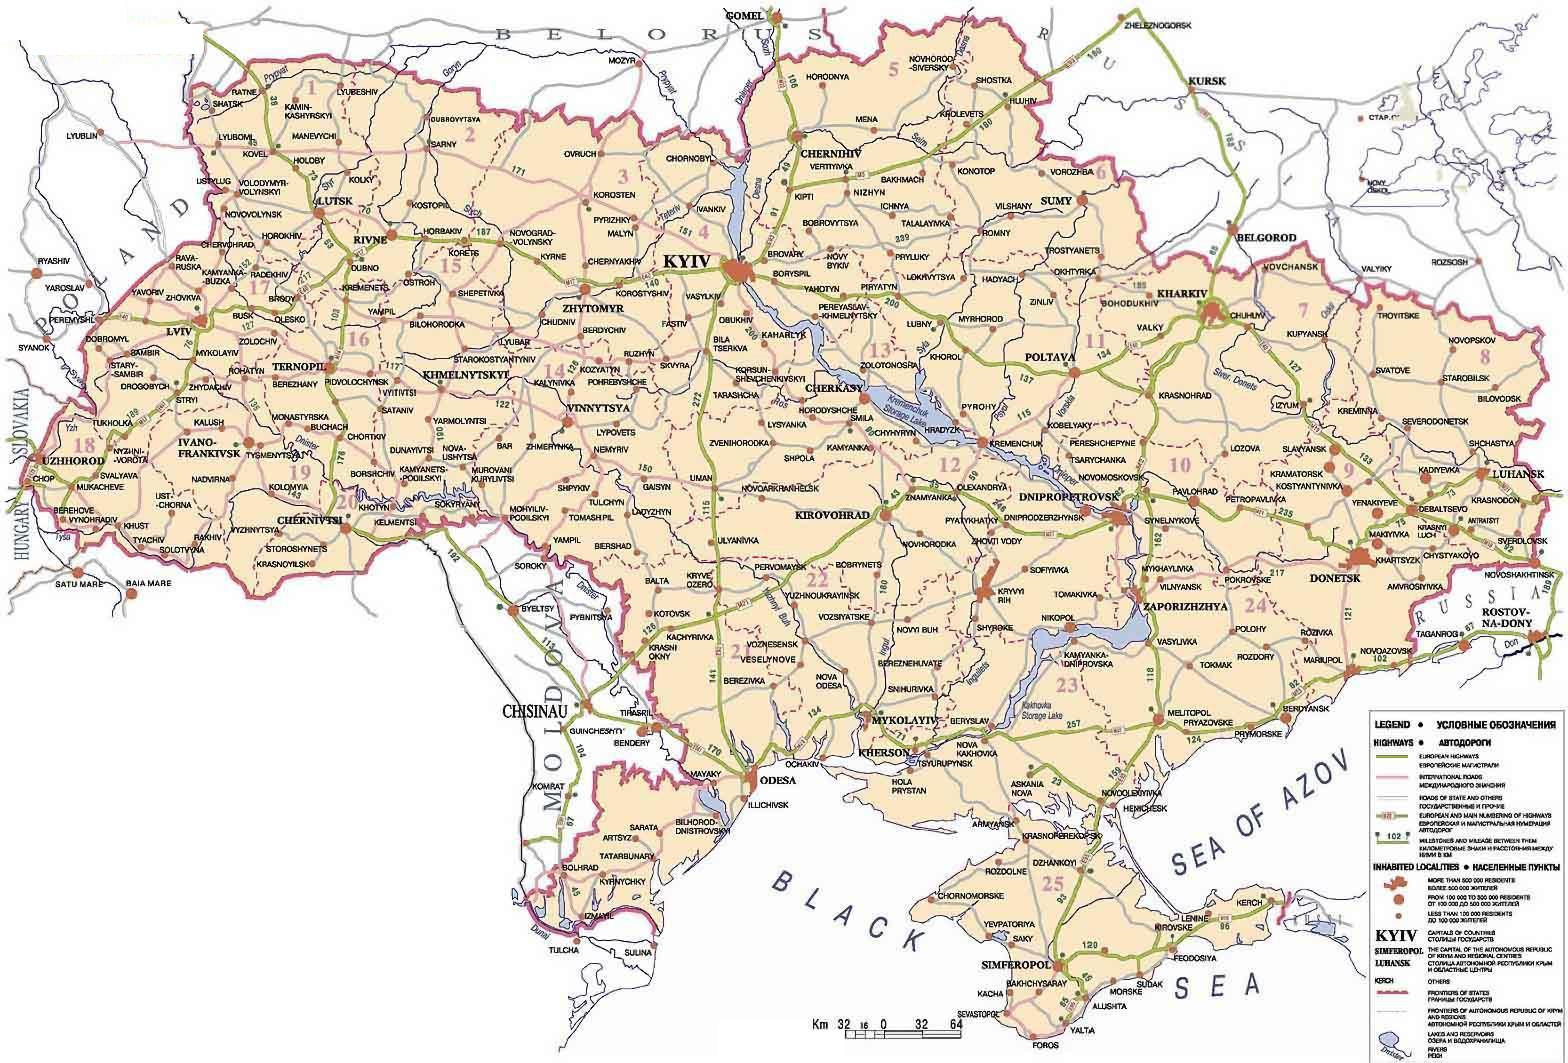 International Map - Map Of International Corridors Of Ukraine